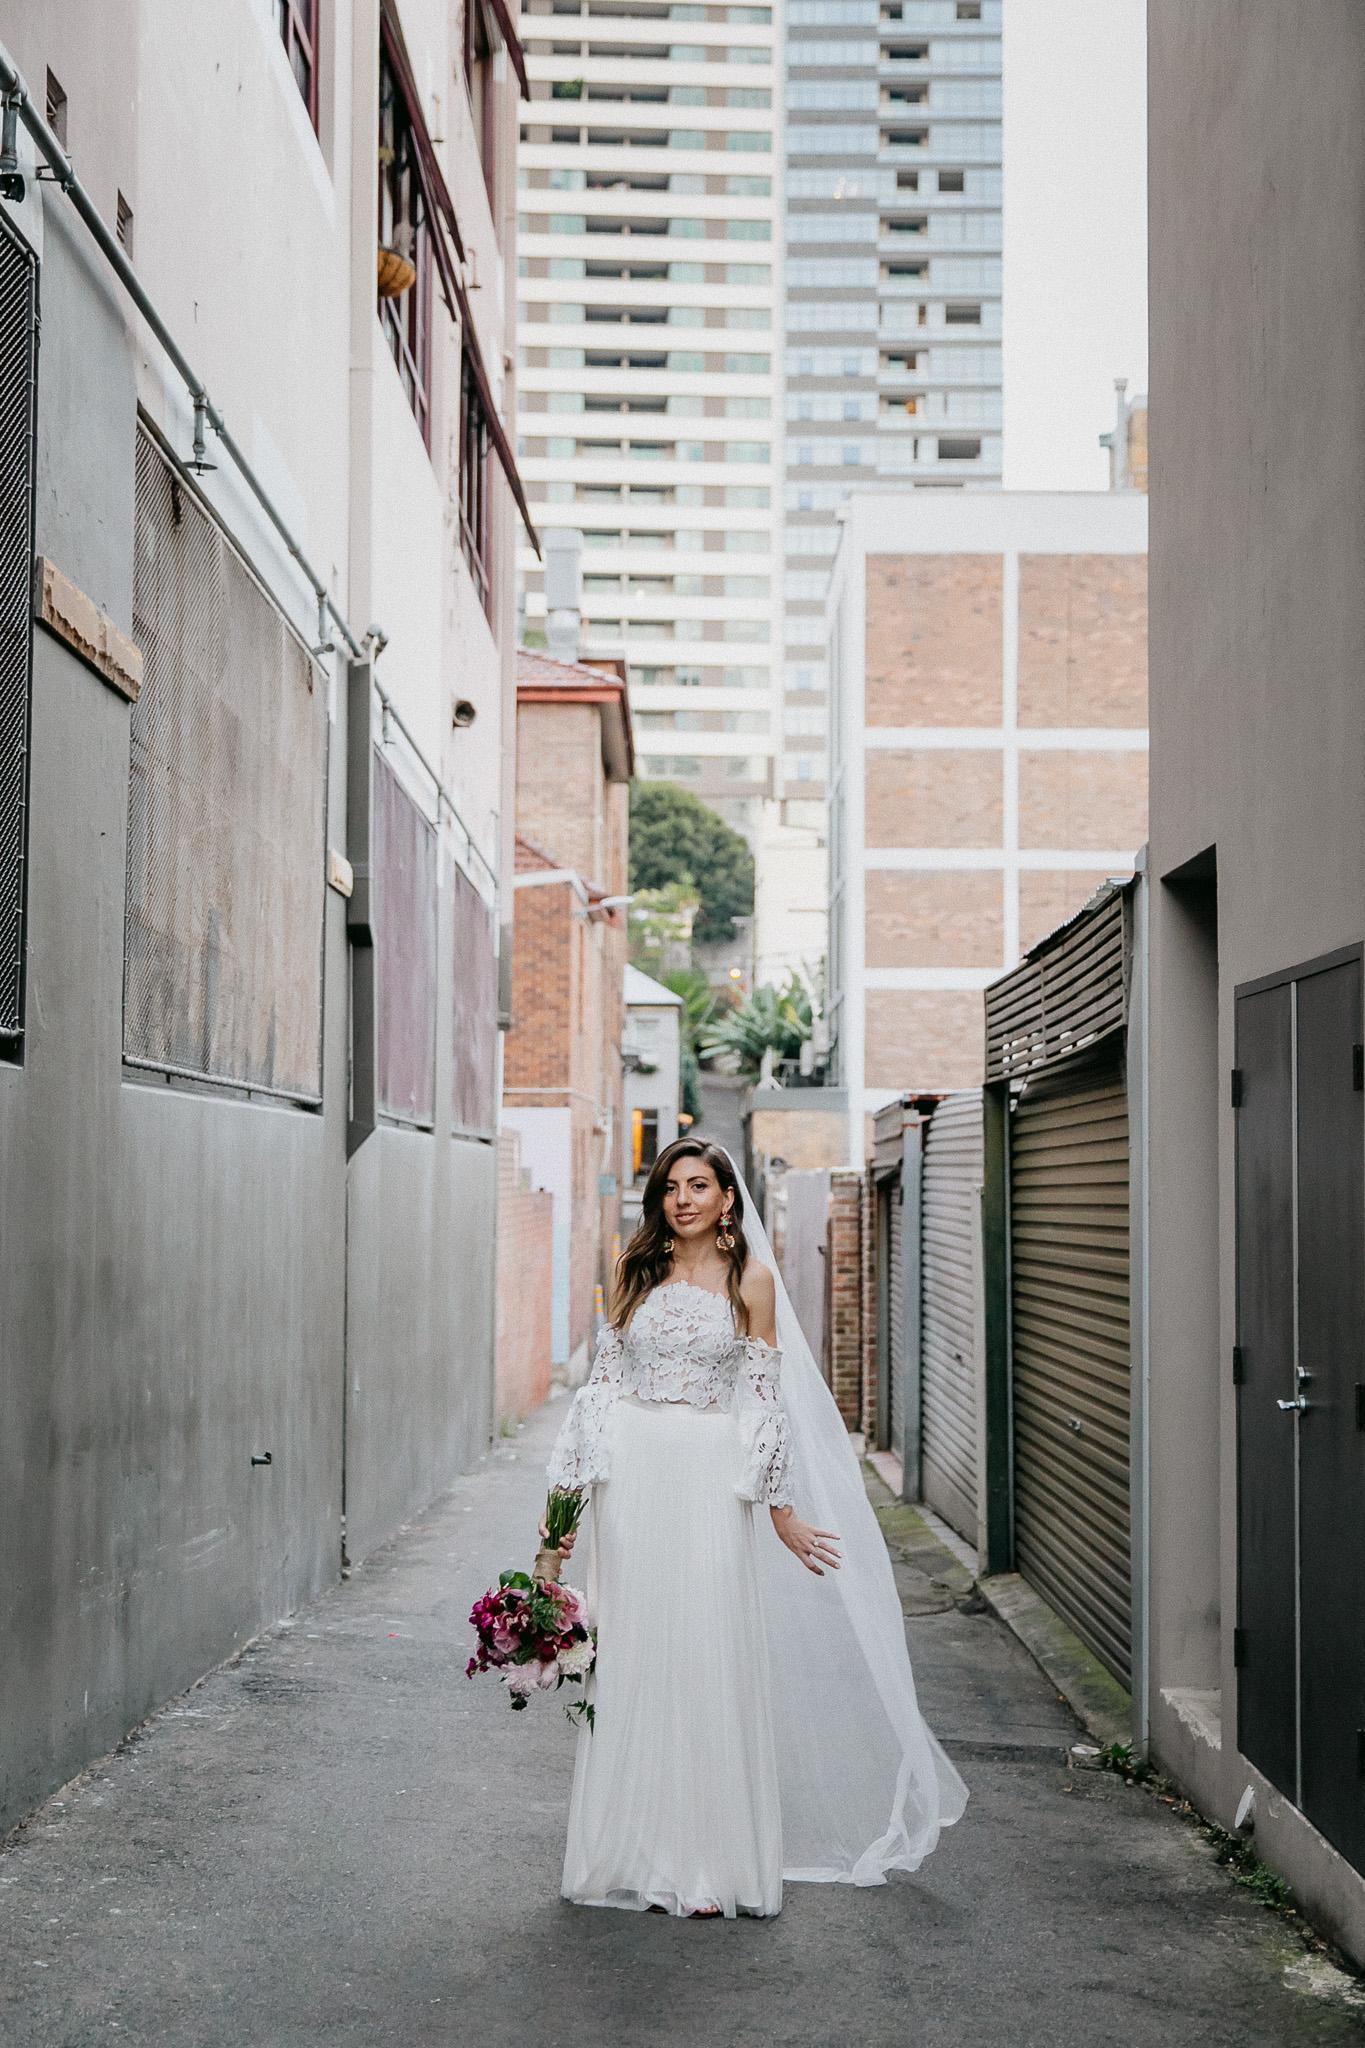 Liz+Alex_2017_credit_OneDaySomewherePhotography-383.jpg